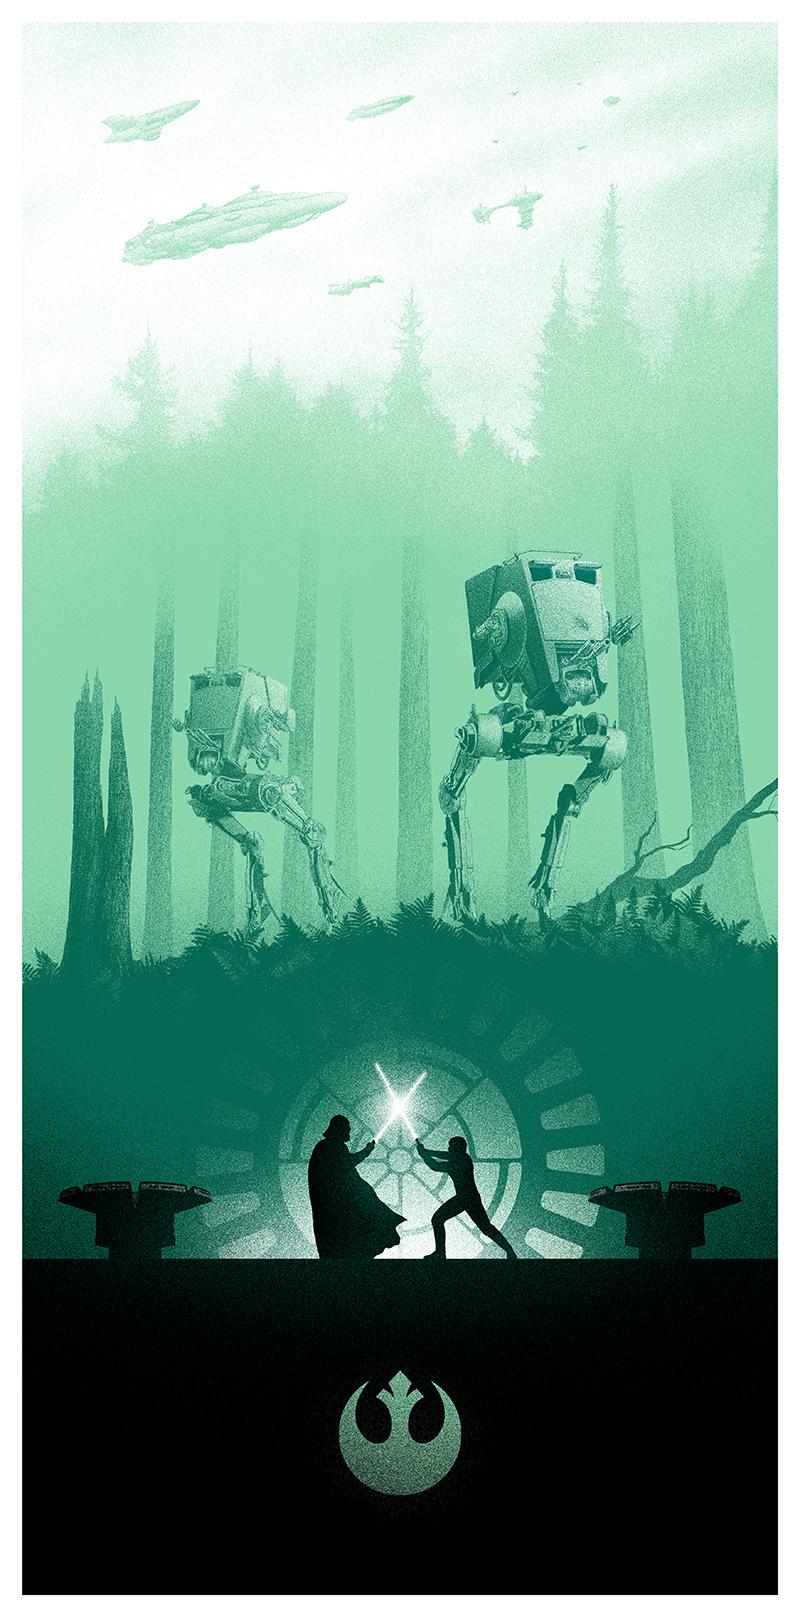 Star Wars Trilogy by Marko Manev2